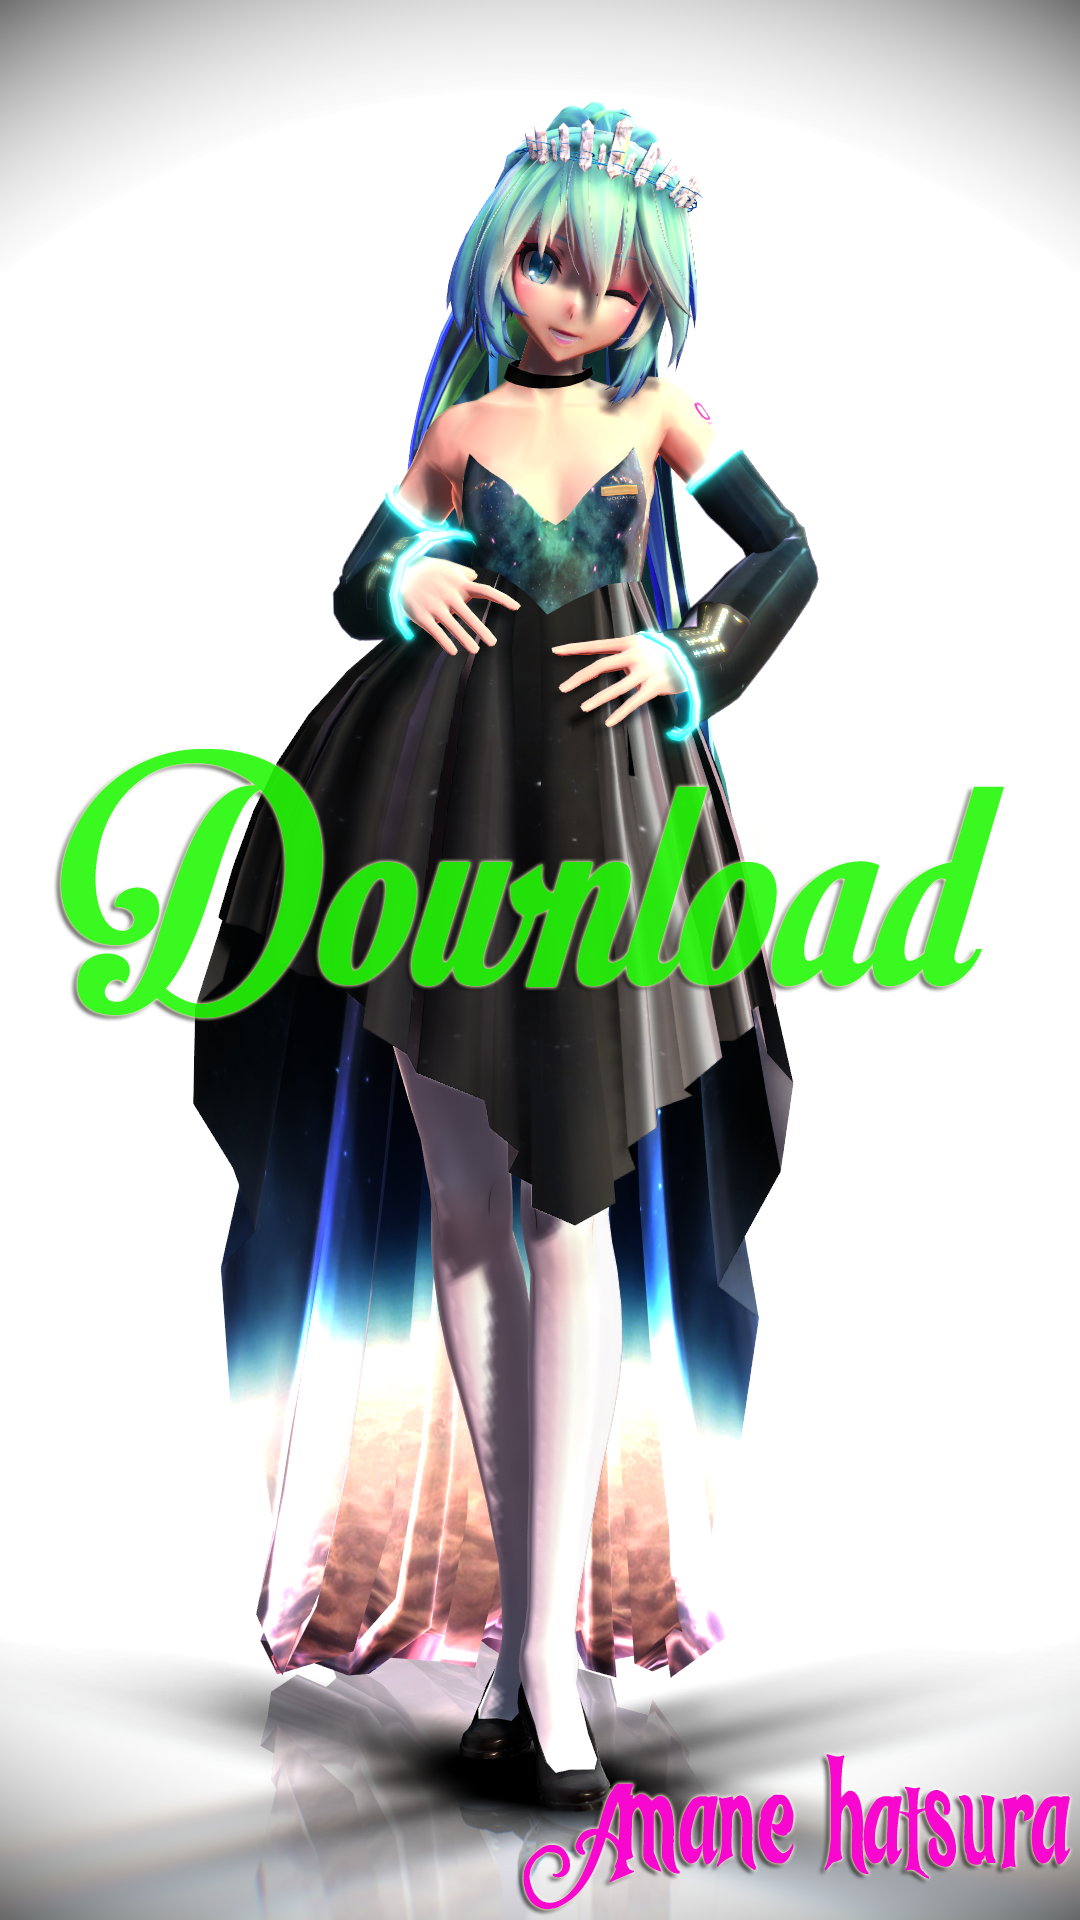 Mmd dress models download by hikariwakamiya on deviantart - Mmd Tda Spice Miku Download By Amanehatsura Deviantart Com On